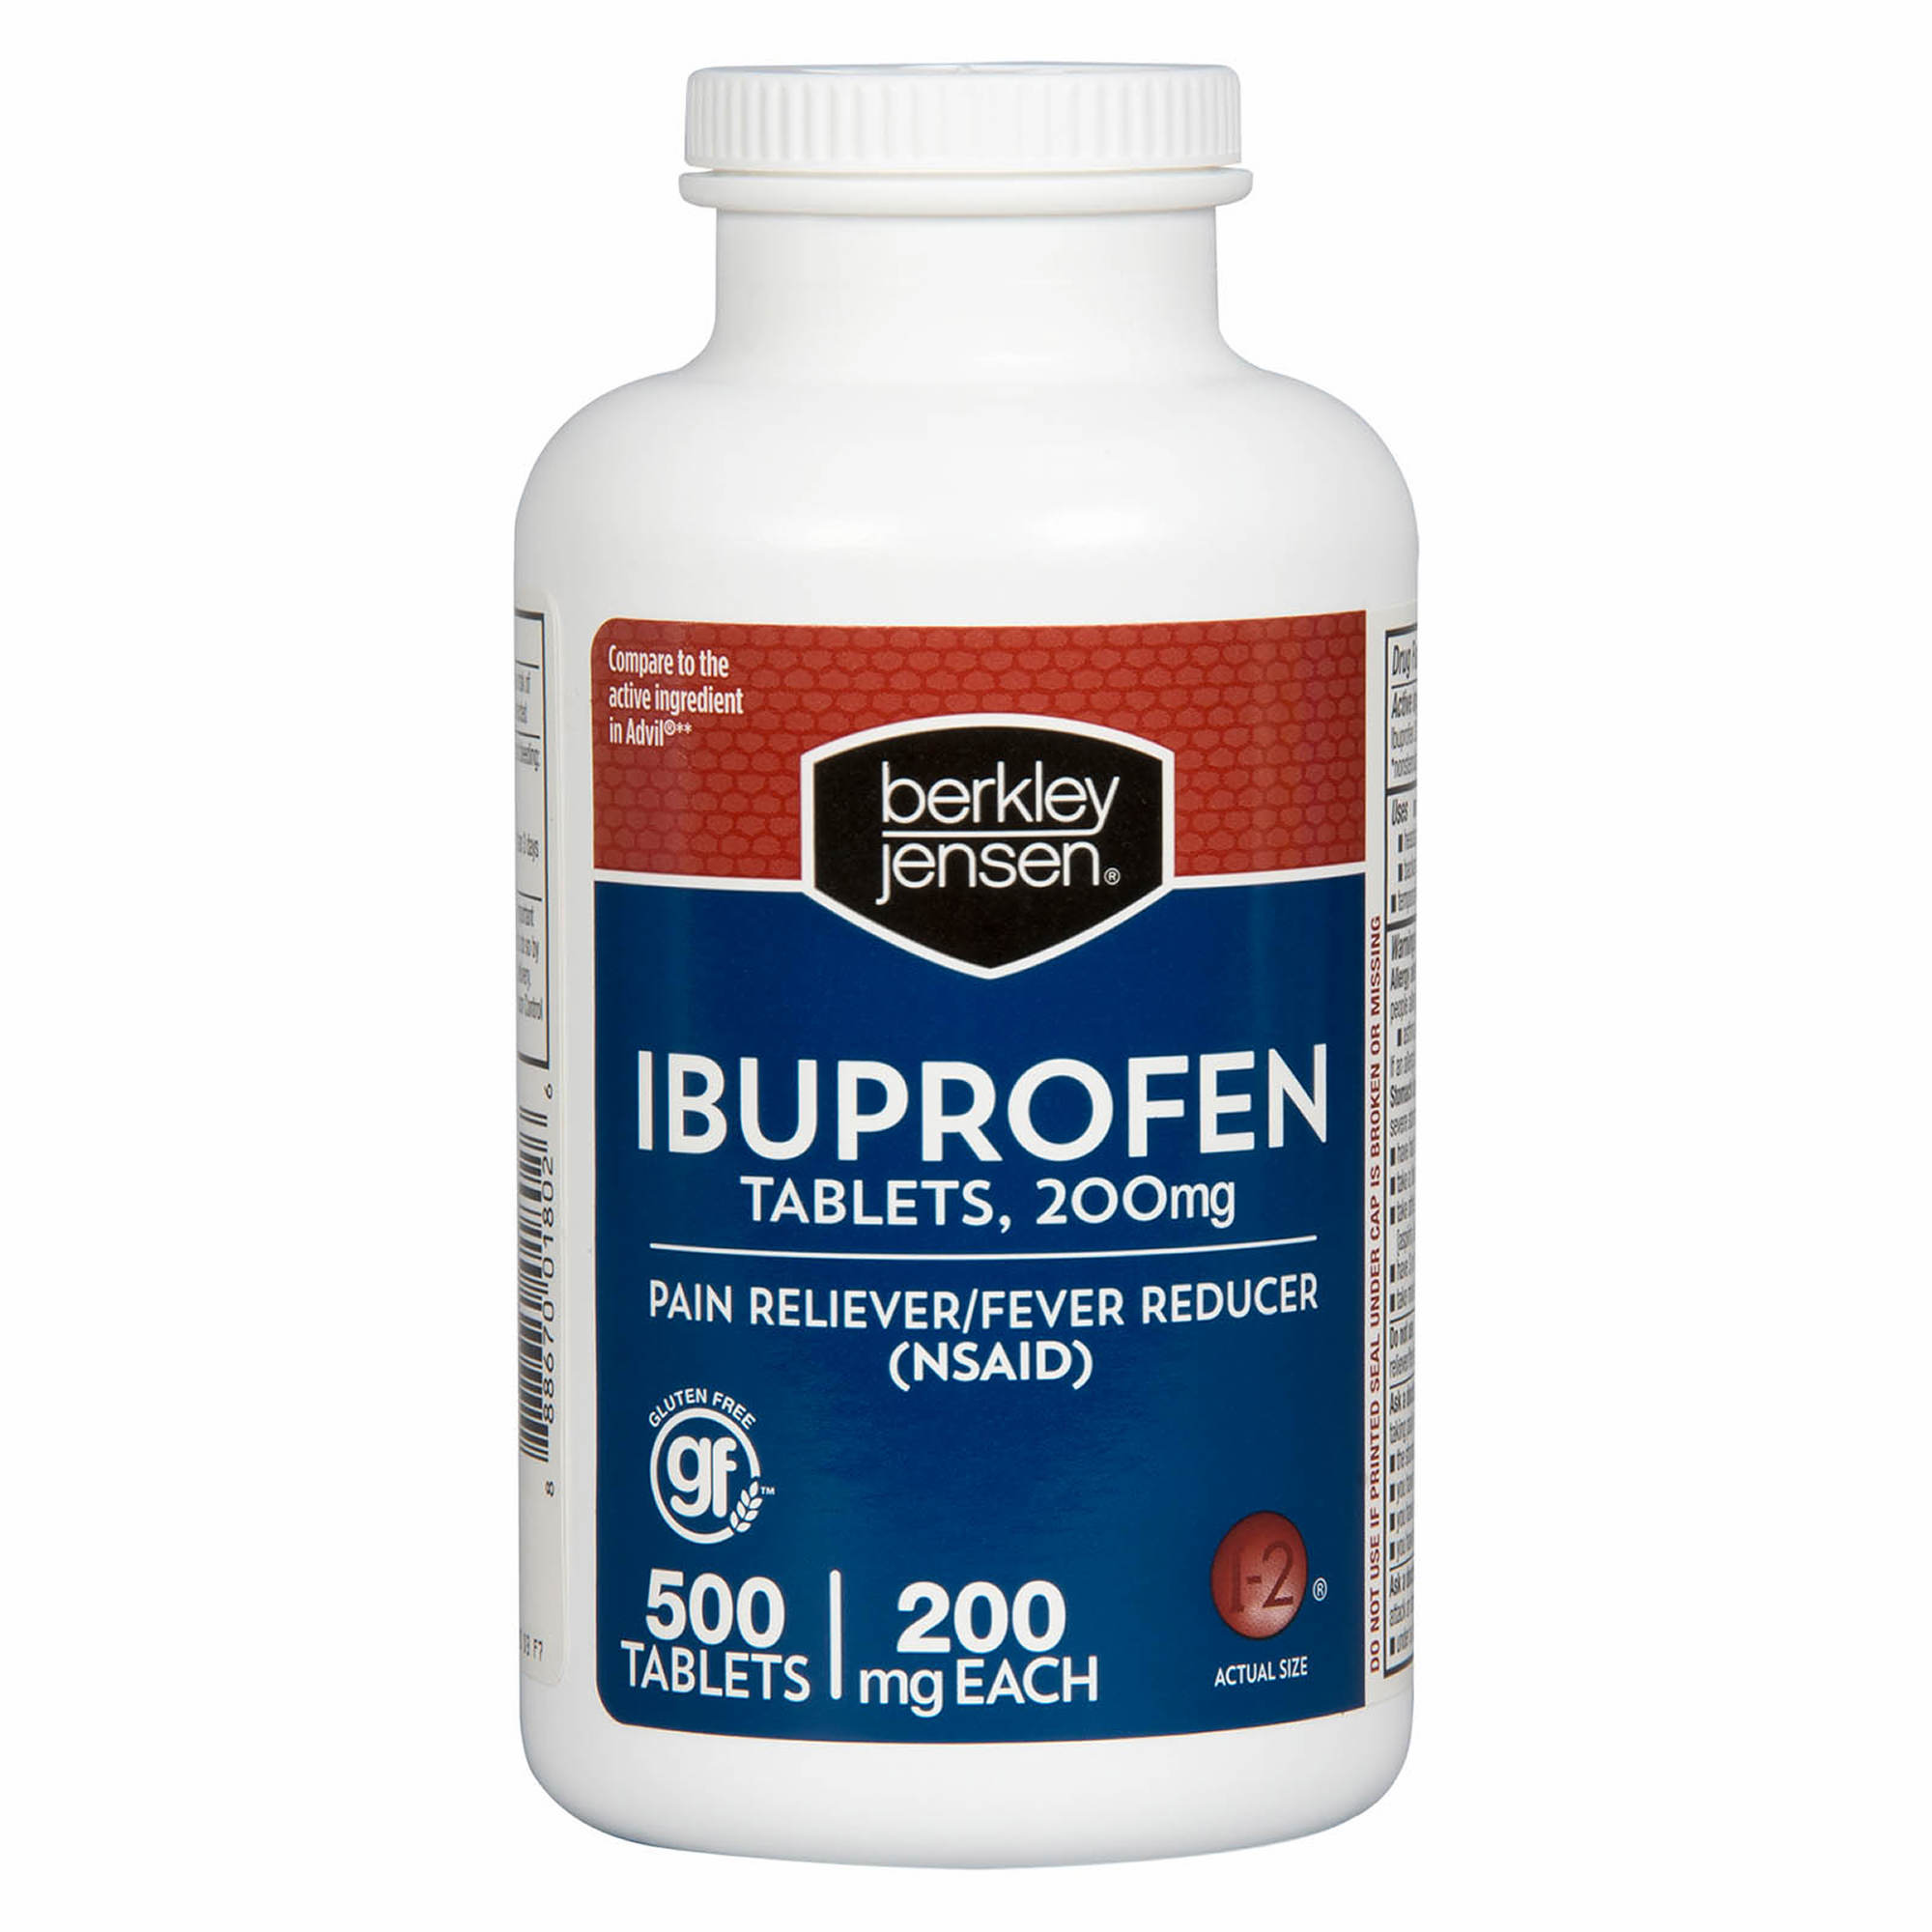 Berkley Jensen 200mg Ibuprofen Tablets 500 Ct Bjs Wholesale Club